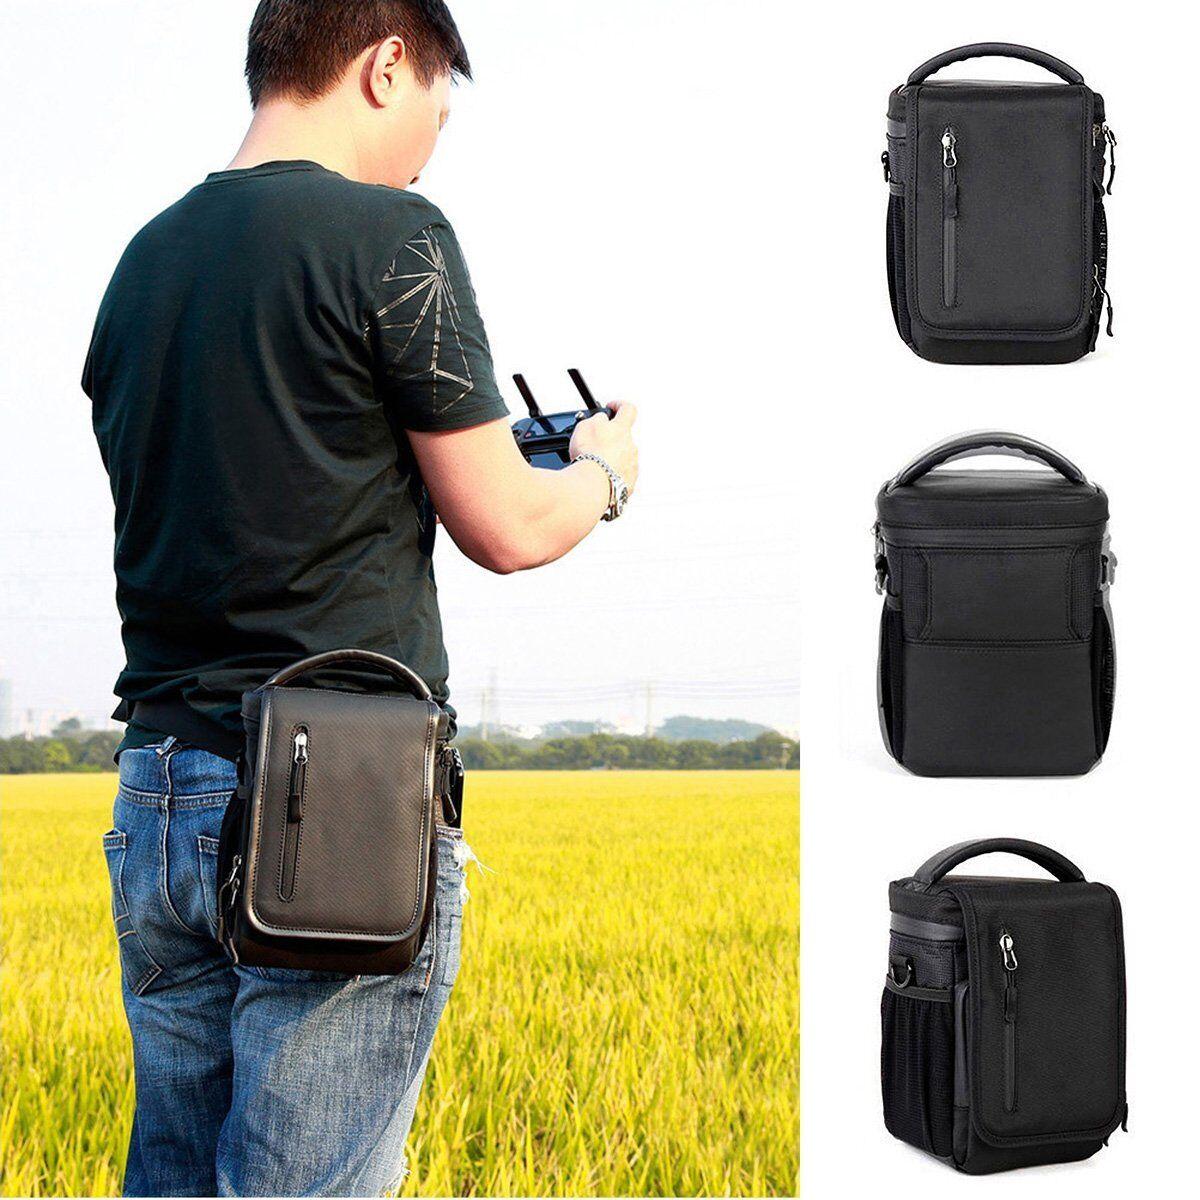 Carrying Storage Waist Bag Bag Bag Travel Case Box Shell for DJI Mavic Pro Accessories a131b1